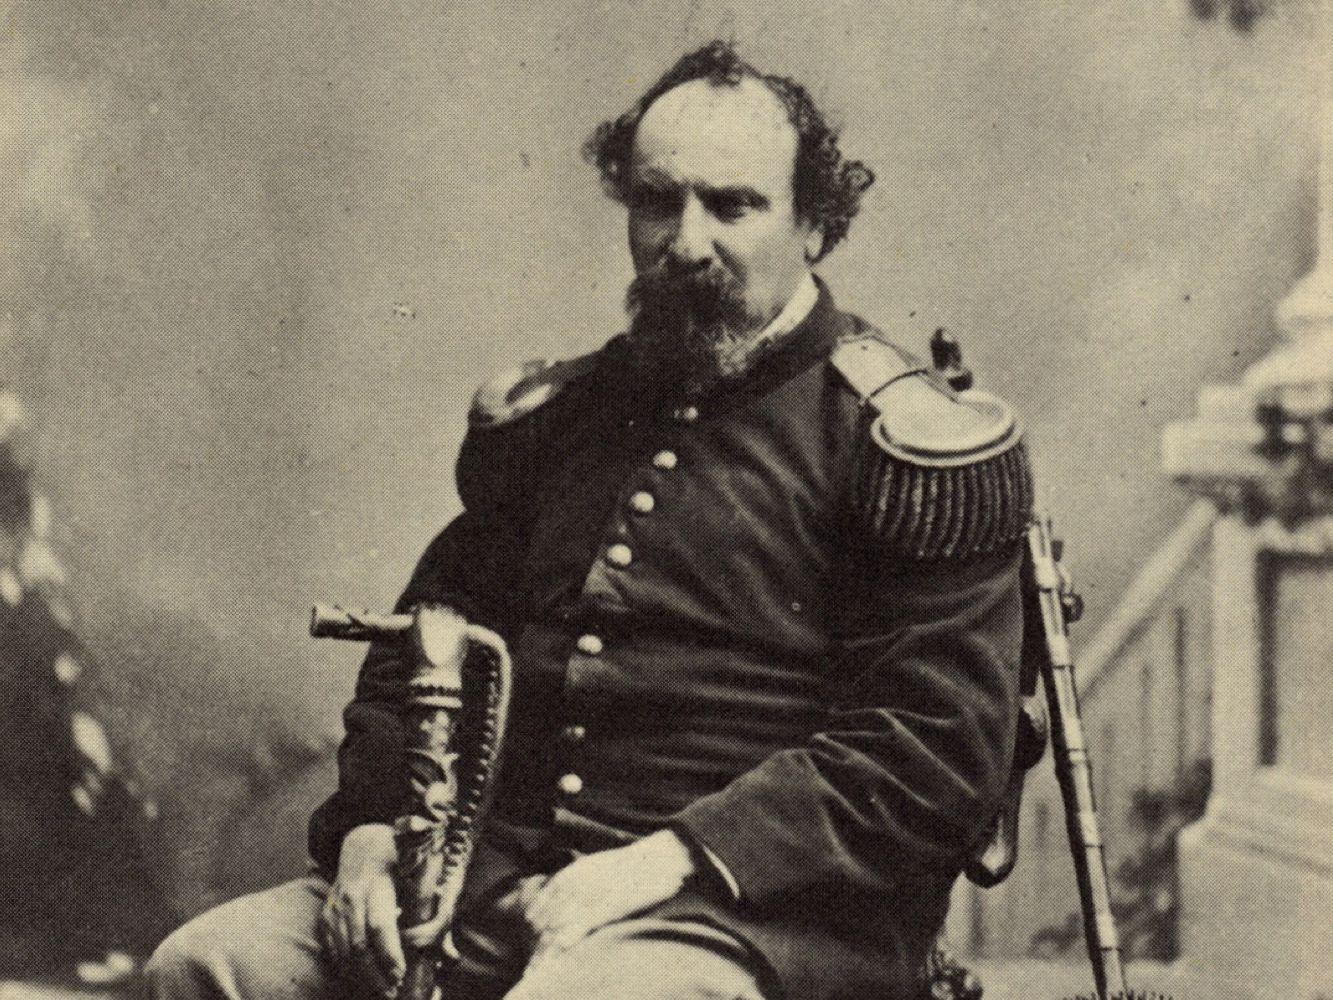 Biography: Joshua Norton, Emperor of the United States